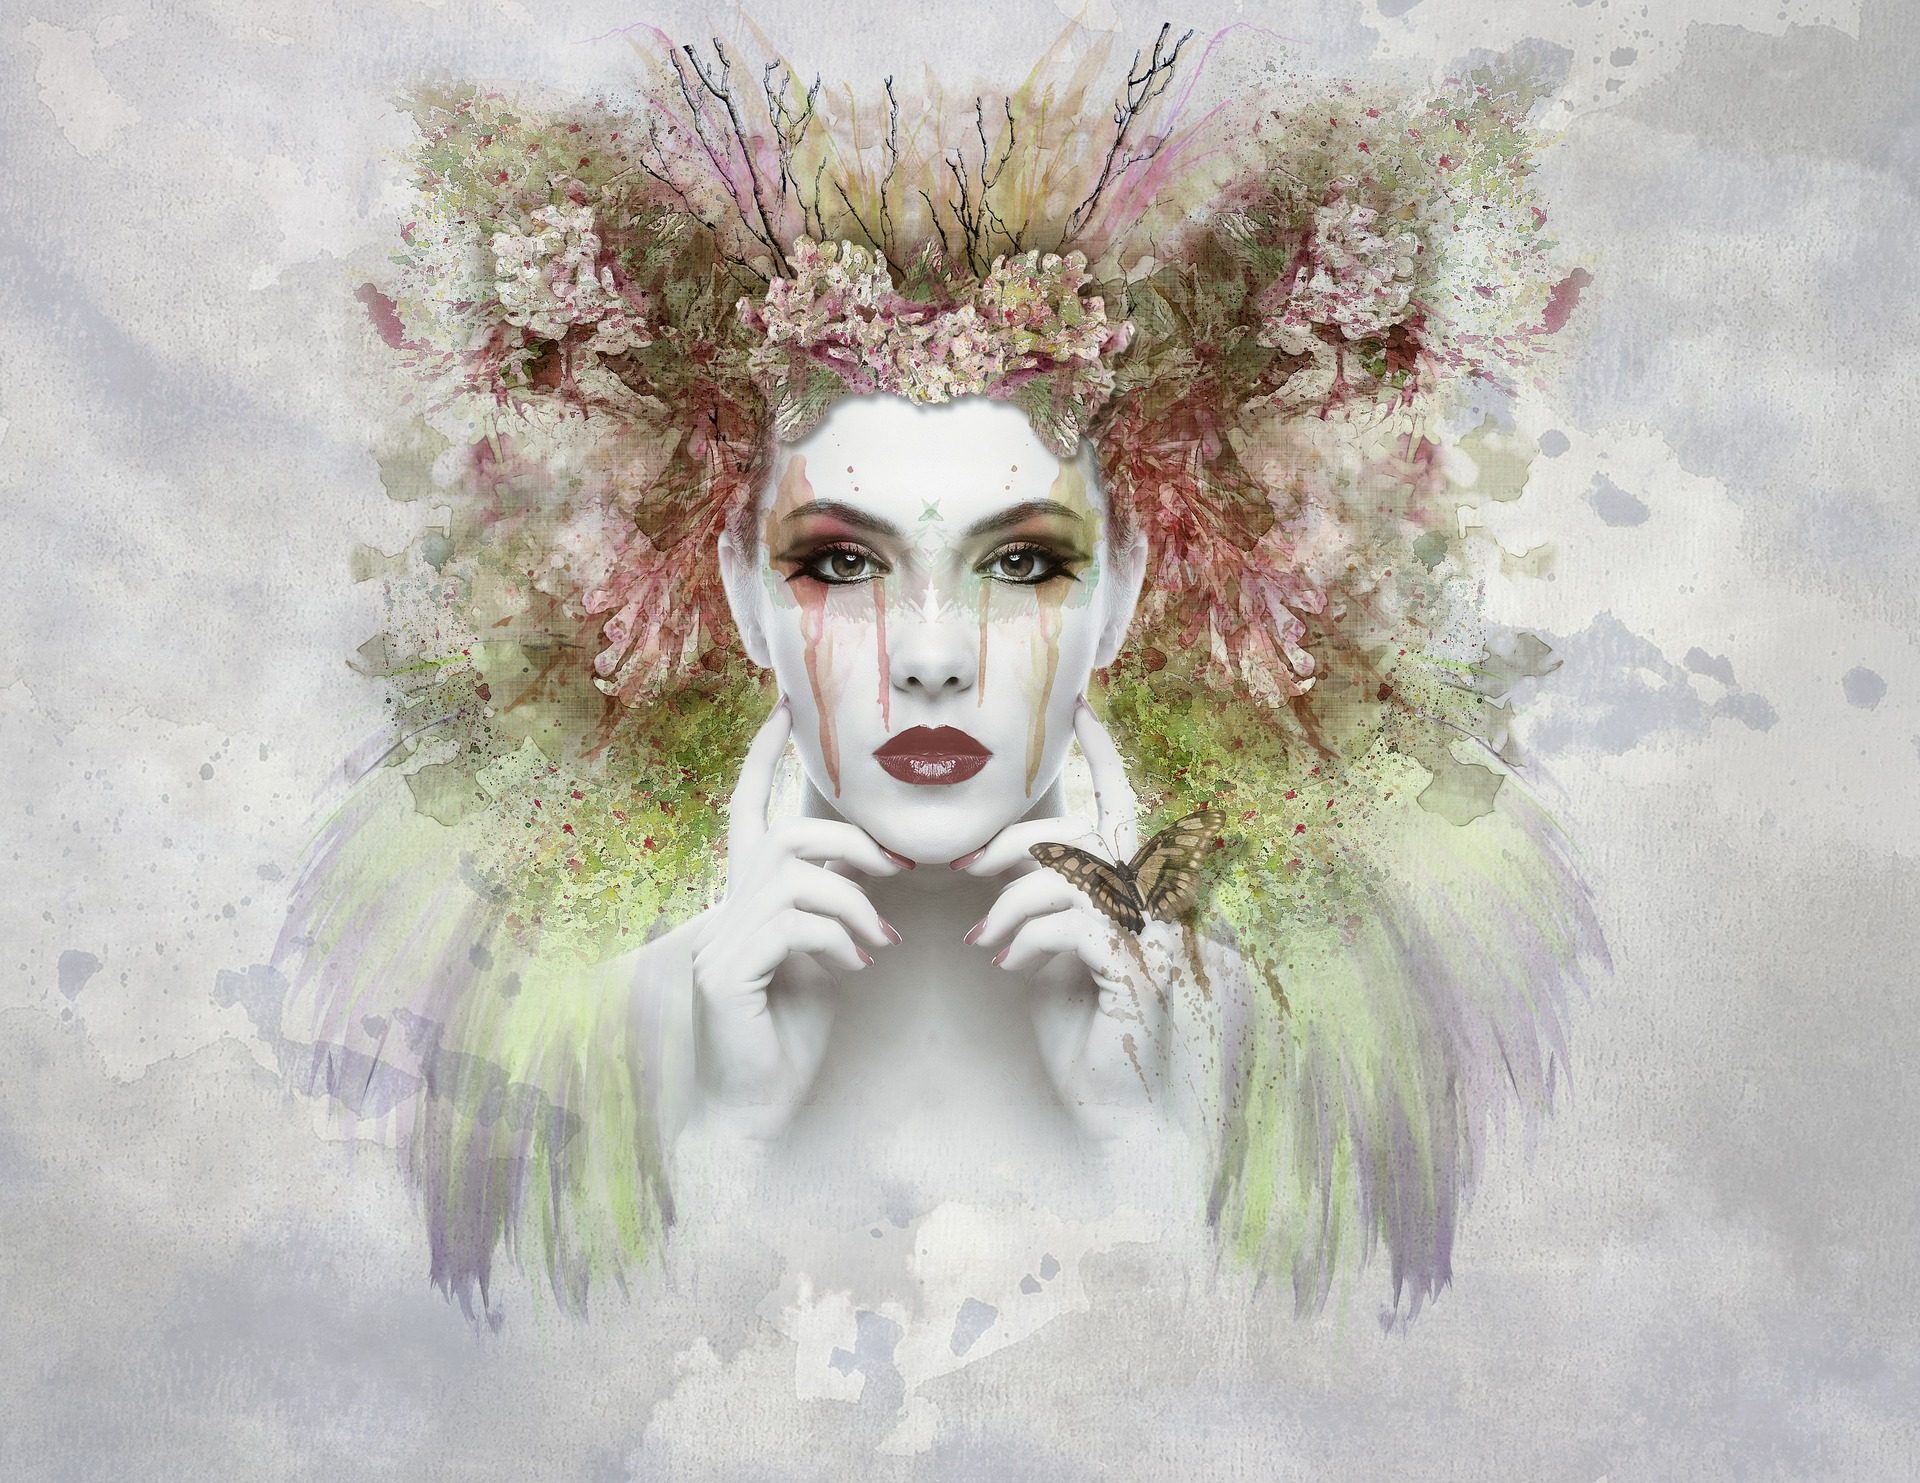 viso, donna, trucco, costume, pittura, arte - Sfondi HD - Professor-falken.com